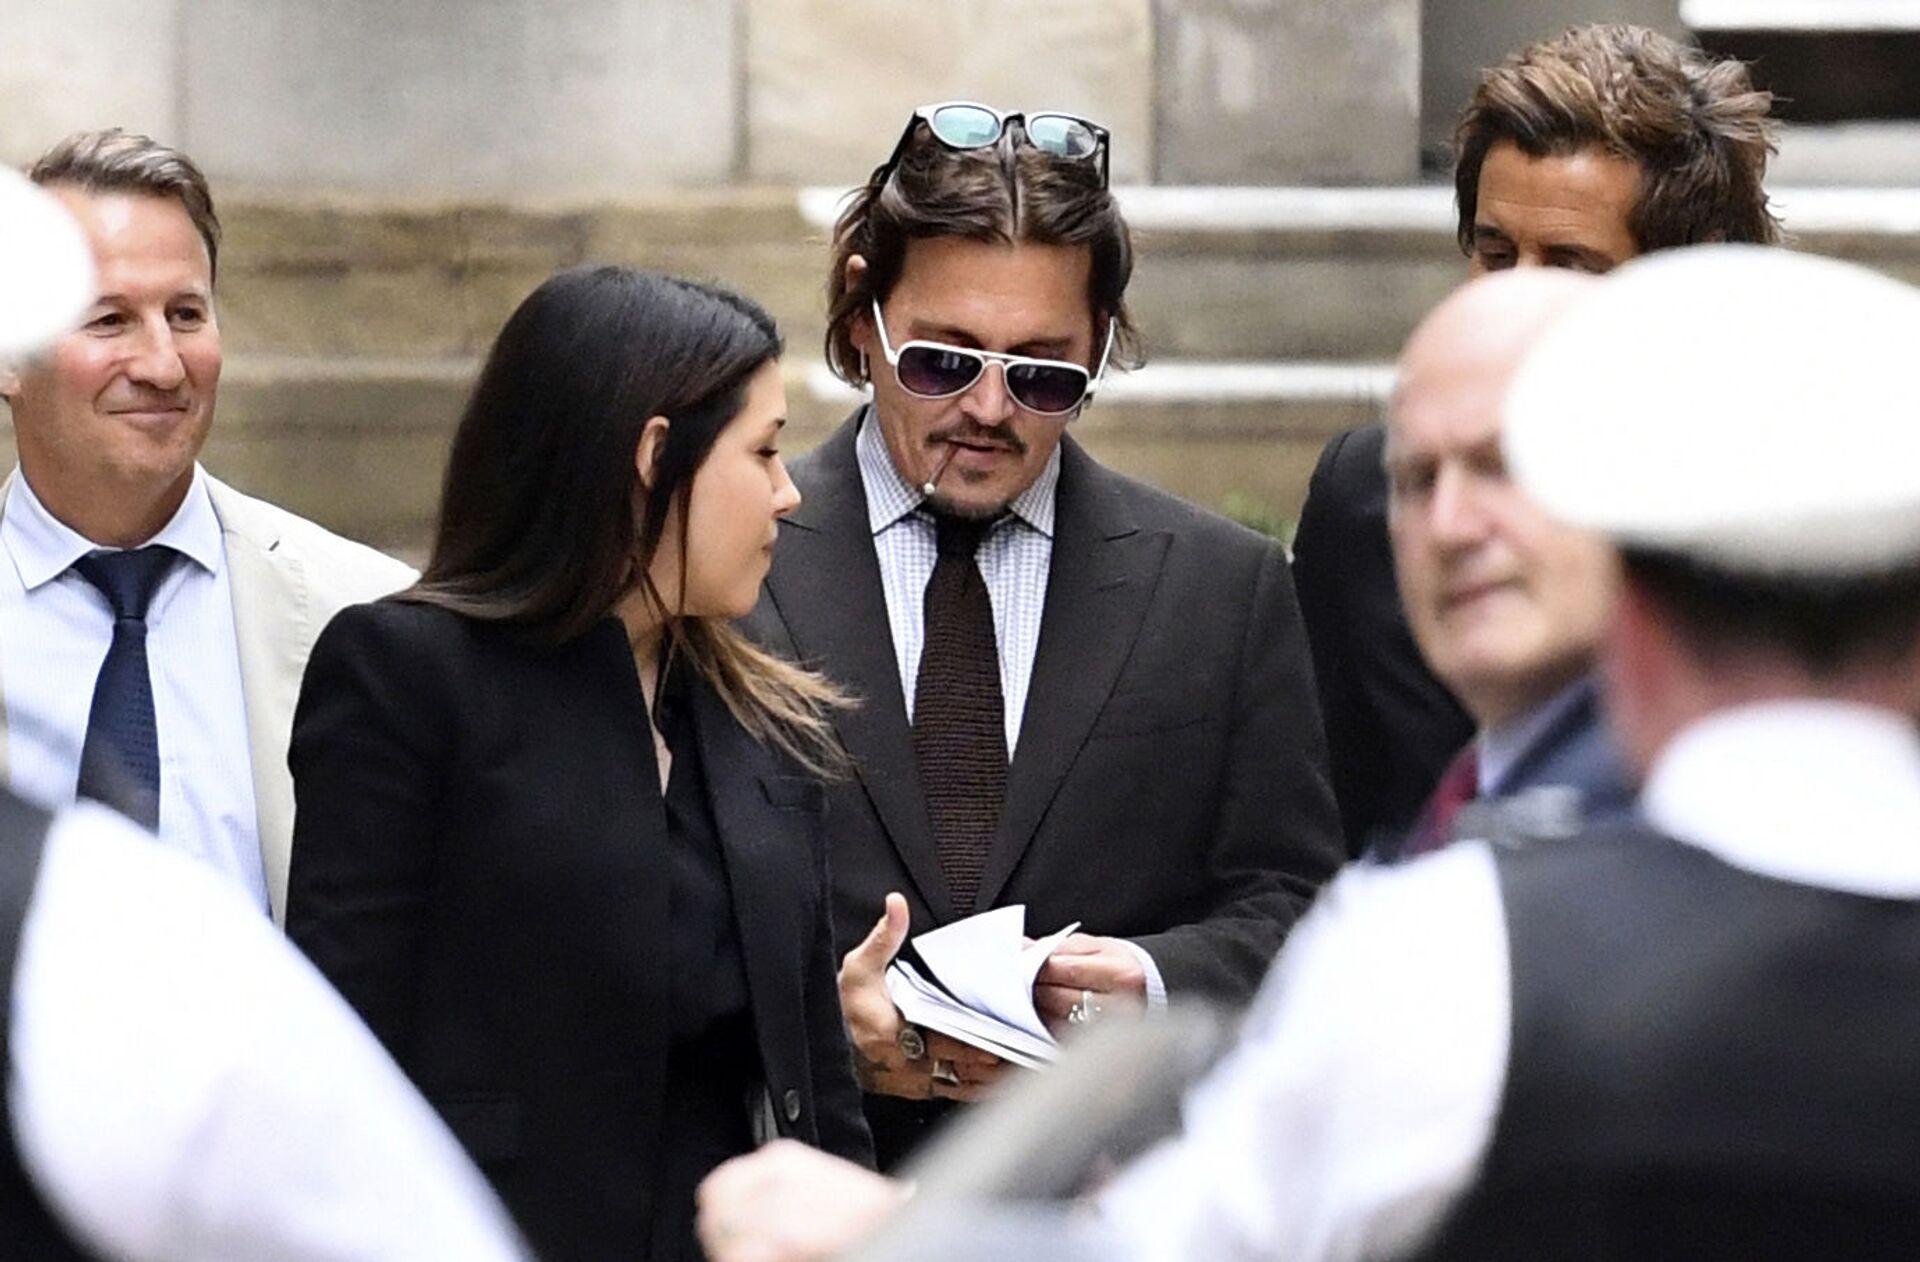 Actor Johnny Depp leaves the High Court in London, Wednesday July 15, 2020 - Sputnik International, 1920, 07.09.2021